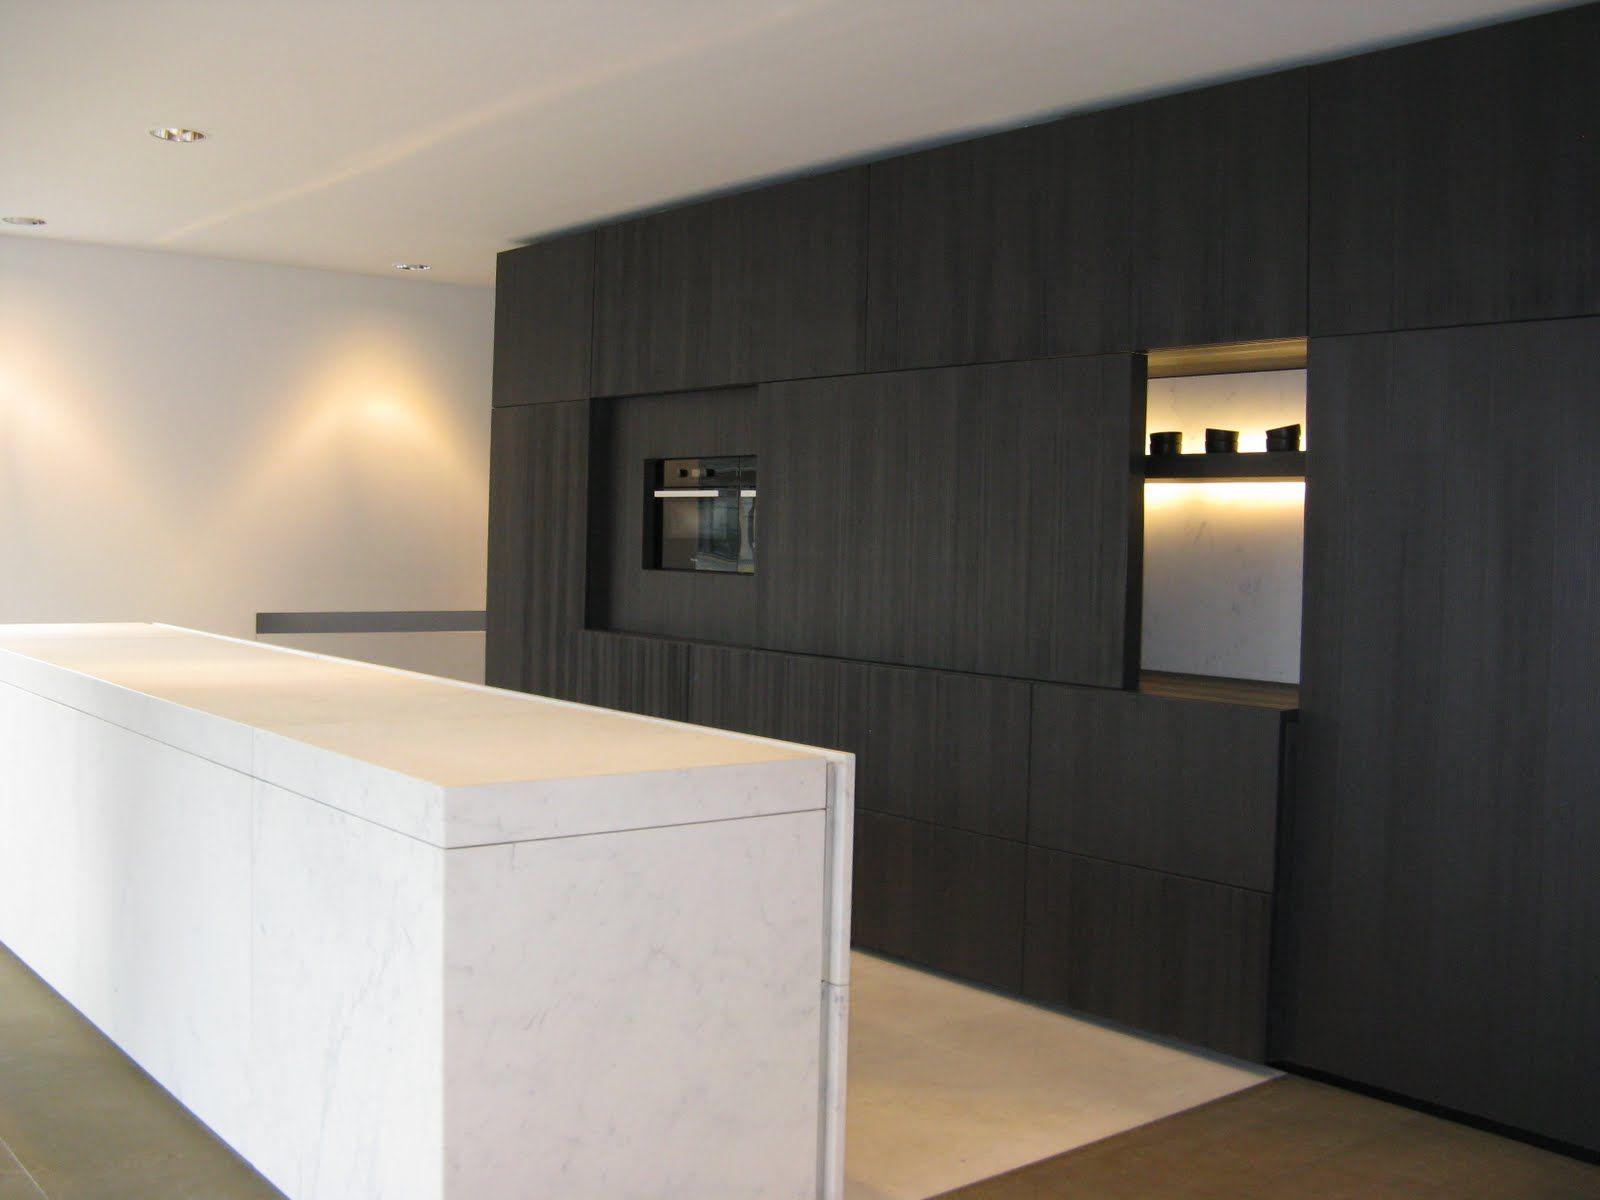 Moderne keuken donker hout wit schuifdeursysteem kastenwand portfolio jacqueline - Moderne keukenkast ...